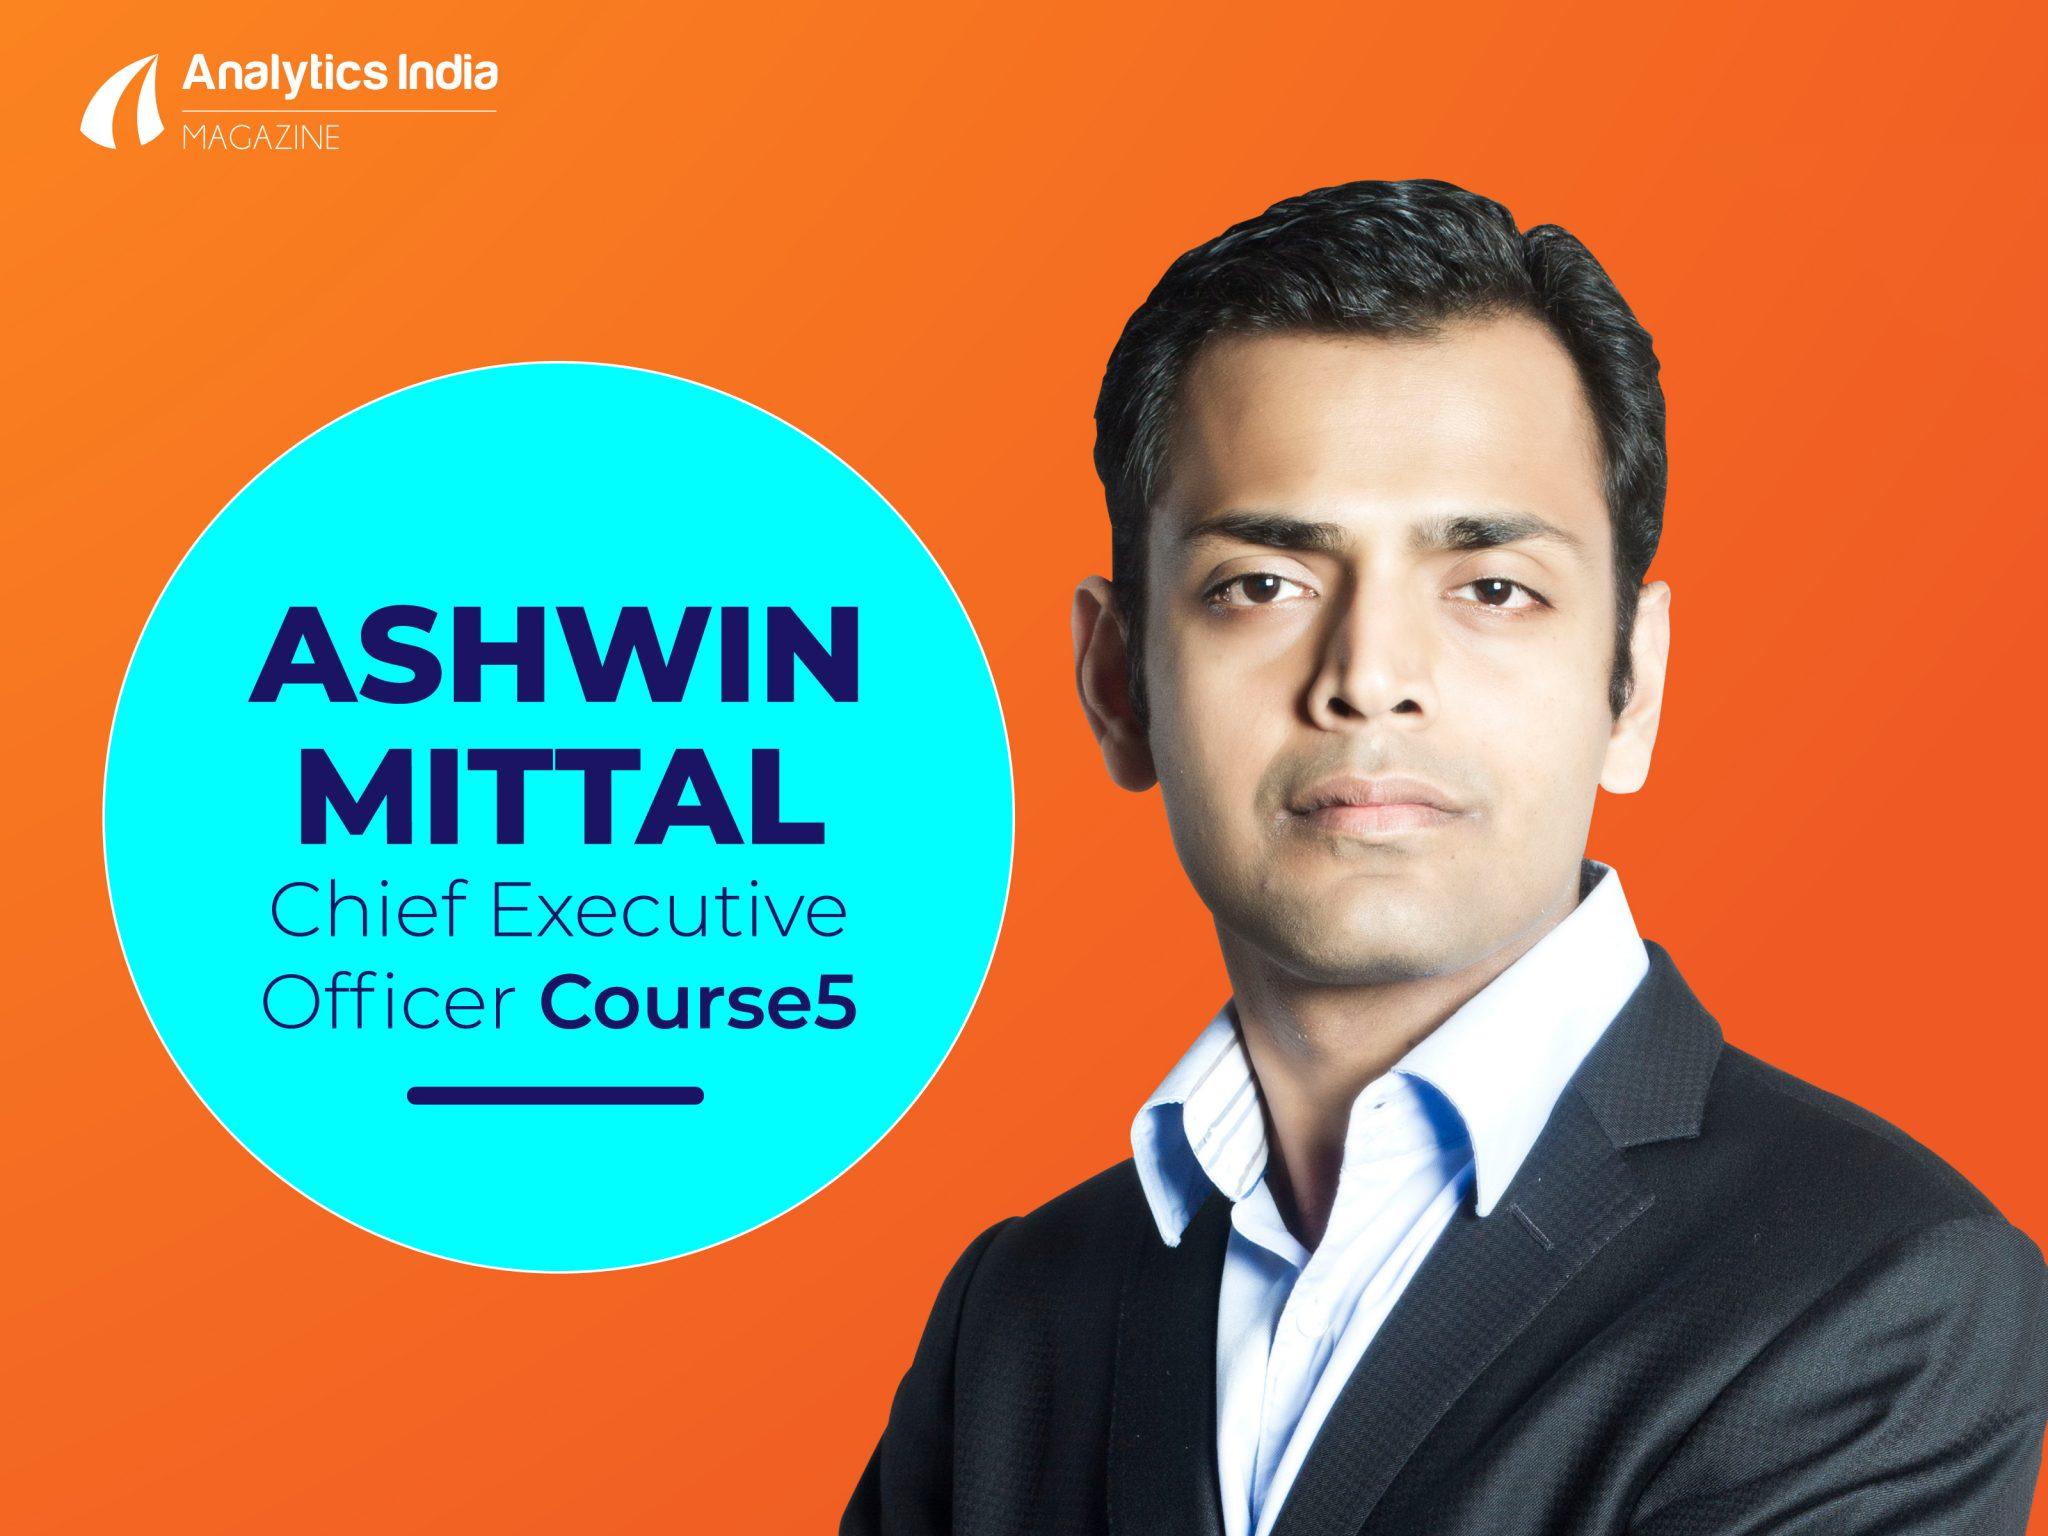 Ashwin Mittal Course5